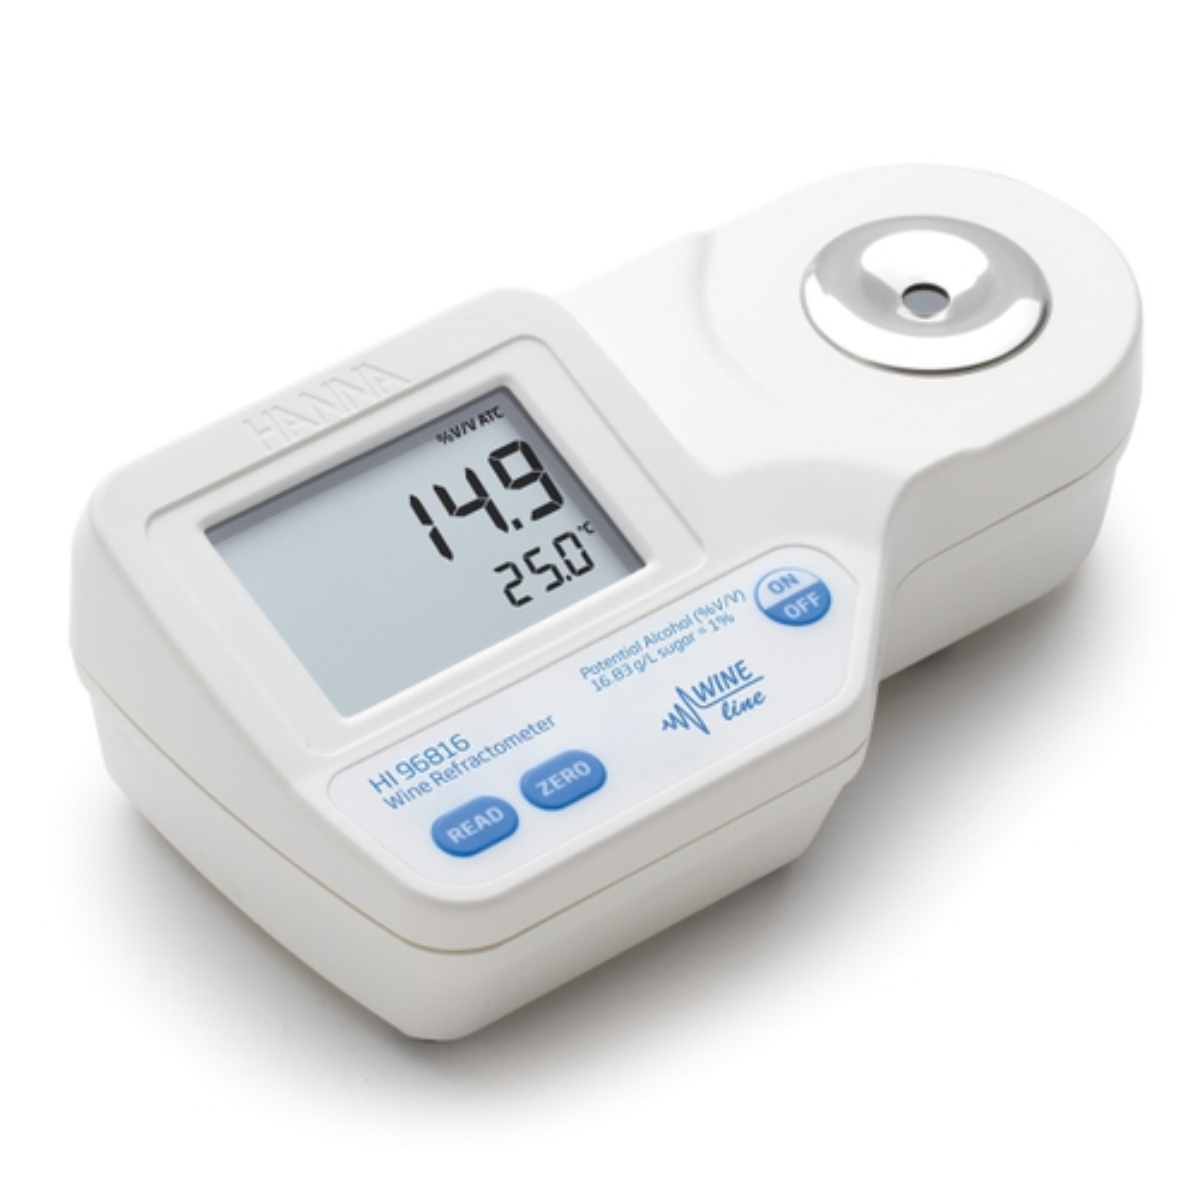 HI96816 Digital Refractometer for Potential Alcohol Analysis in Wine (high range)